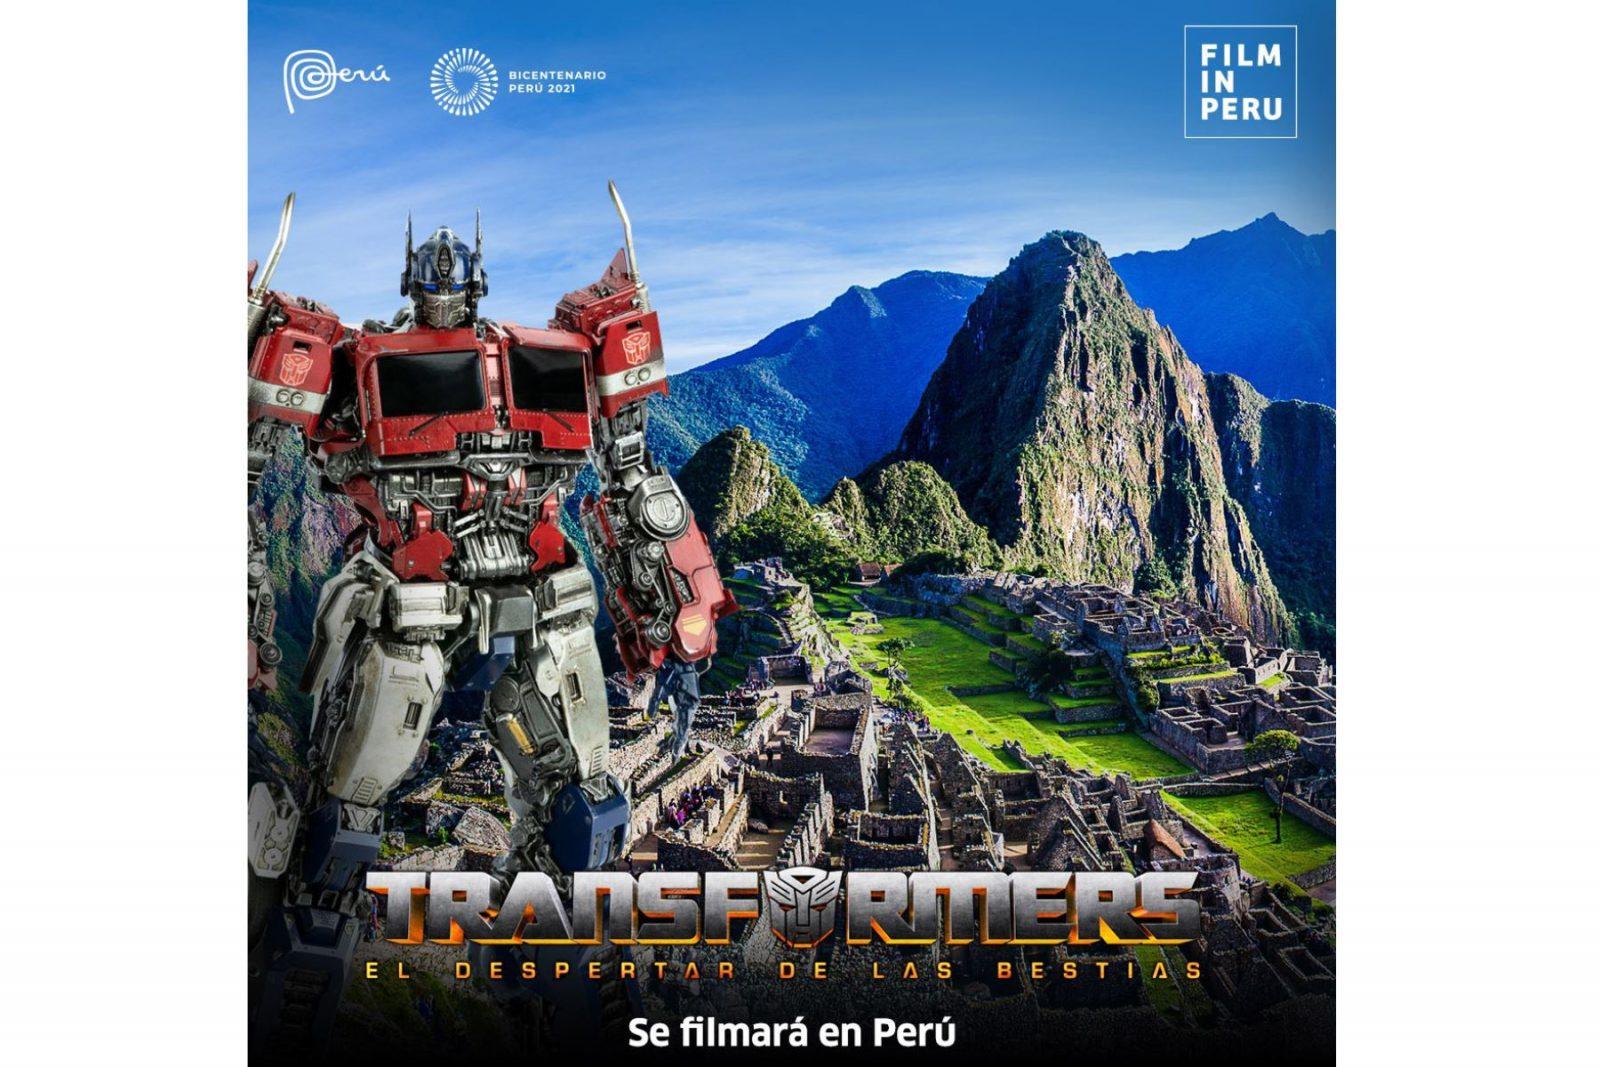 La película Transformers se continua grabando en Machu Picchu